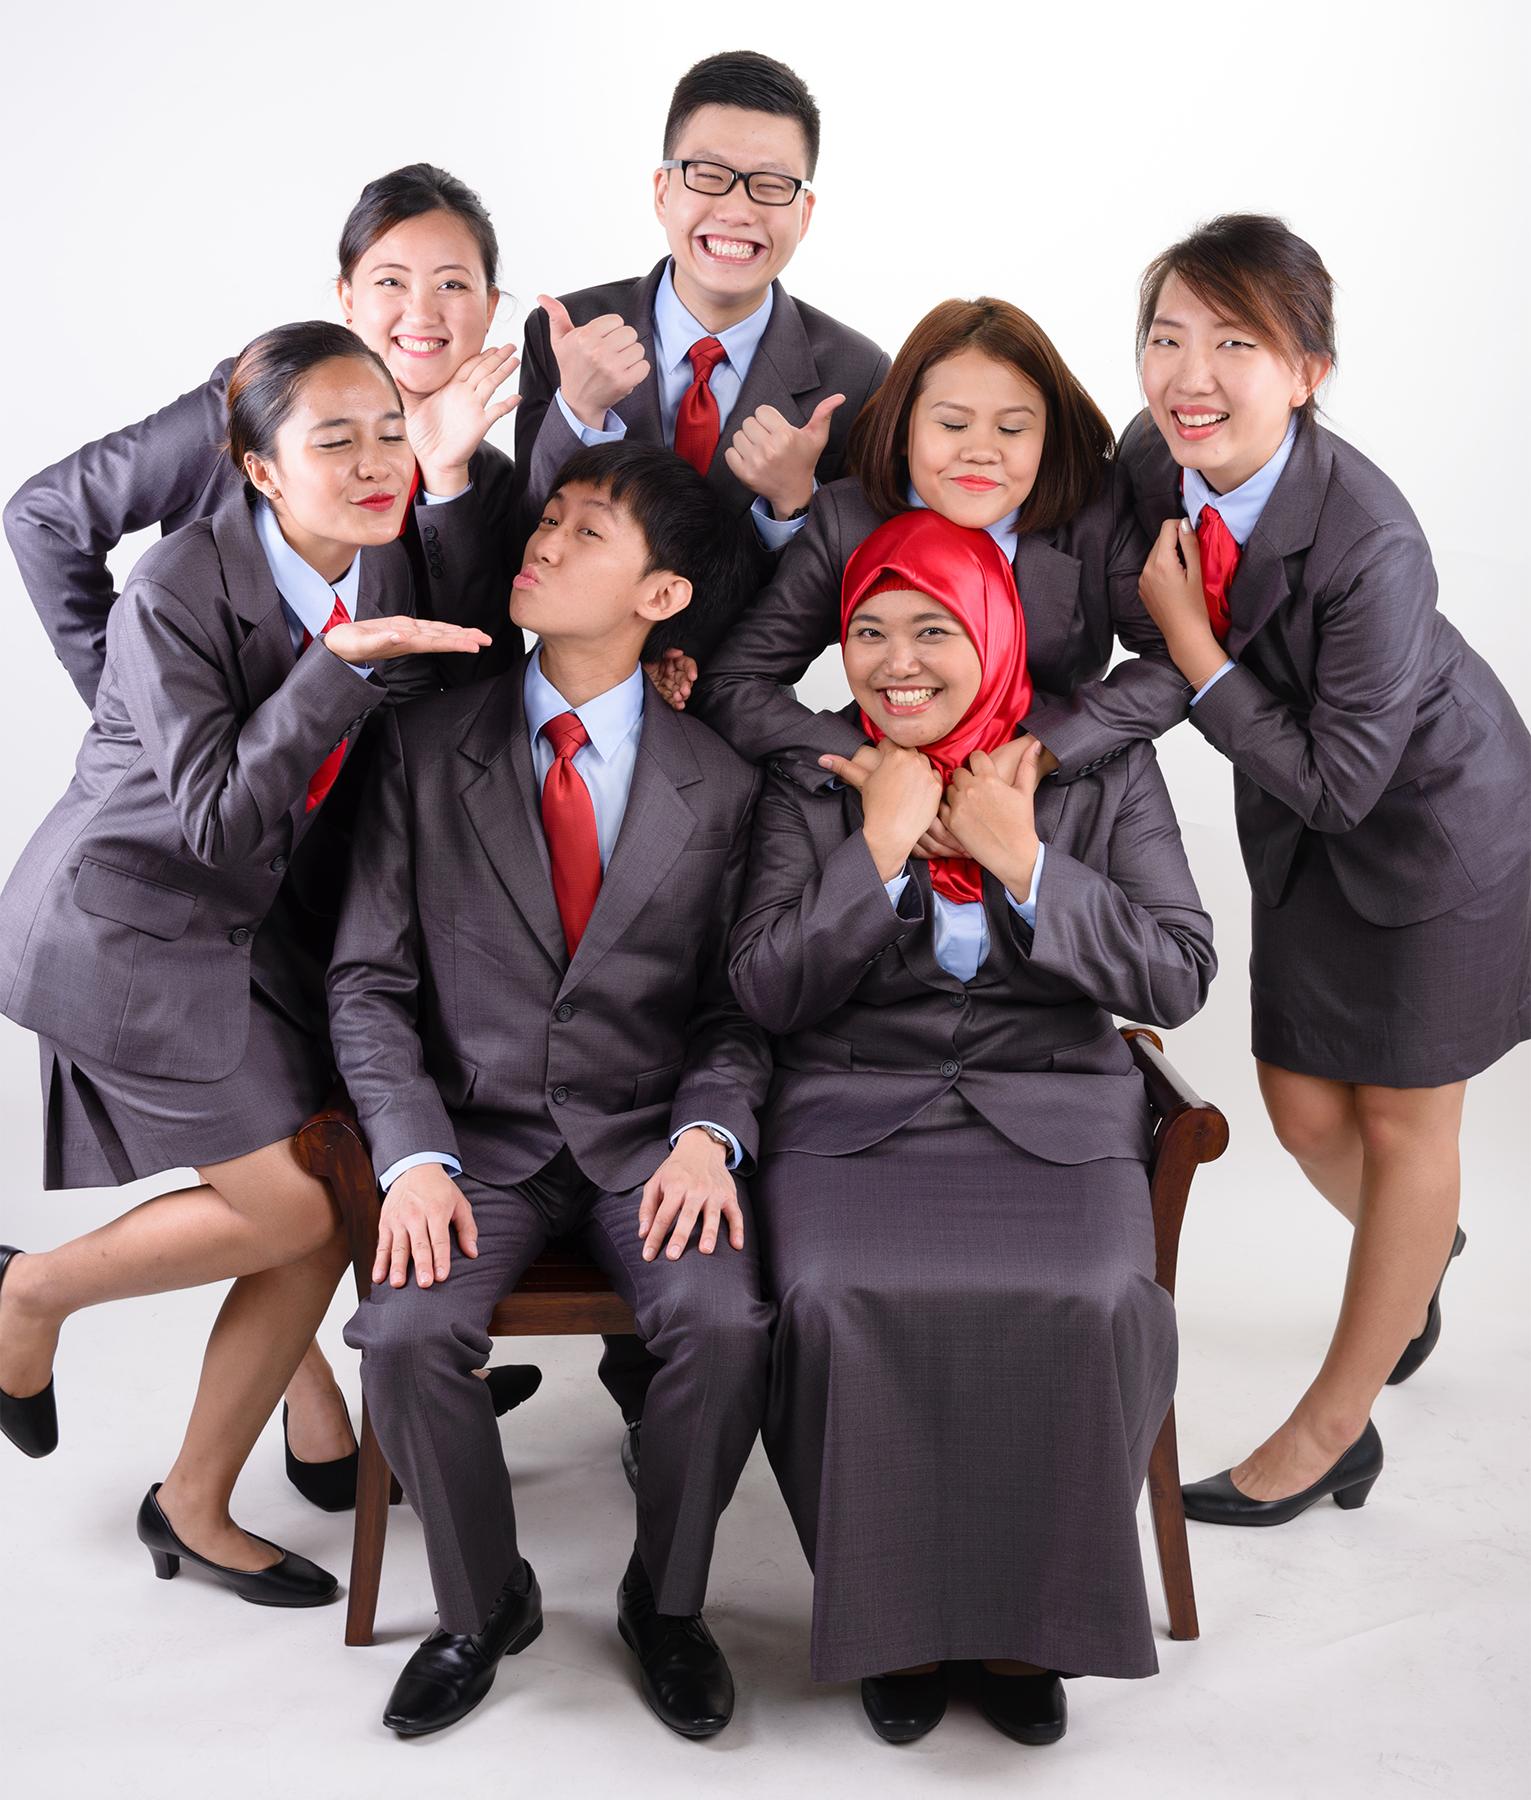 L-R: Astiqah, Esther, Elijah, Choon Leong, Hyd, Rahmuna, Wanlin. Photo took by: ZZ, 2015.